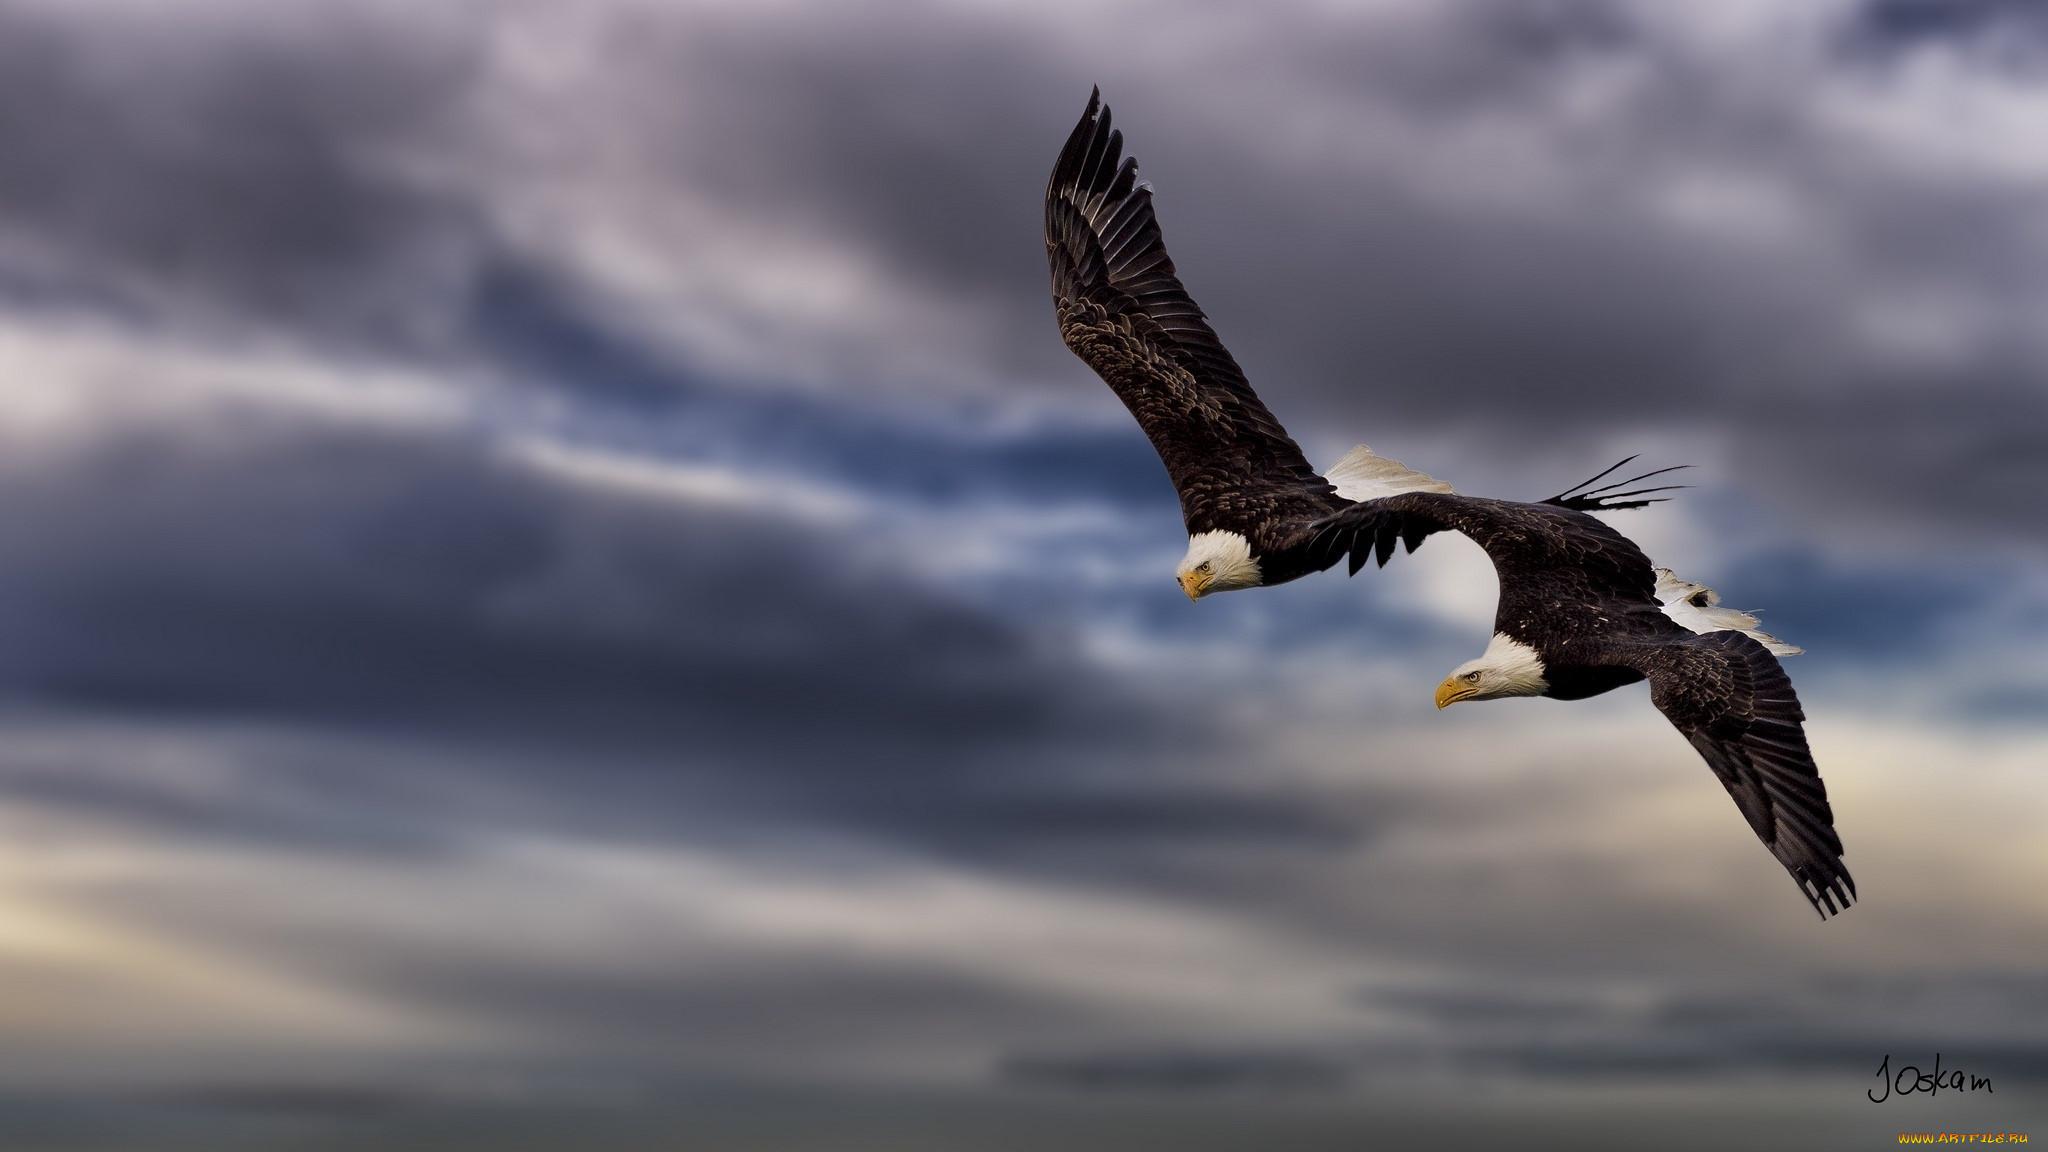 проруби картинки небо с птицами парами стены также могут